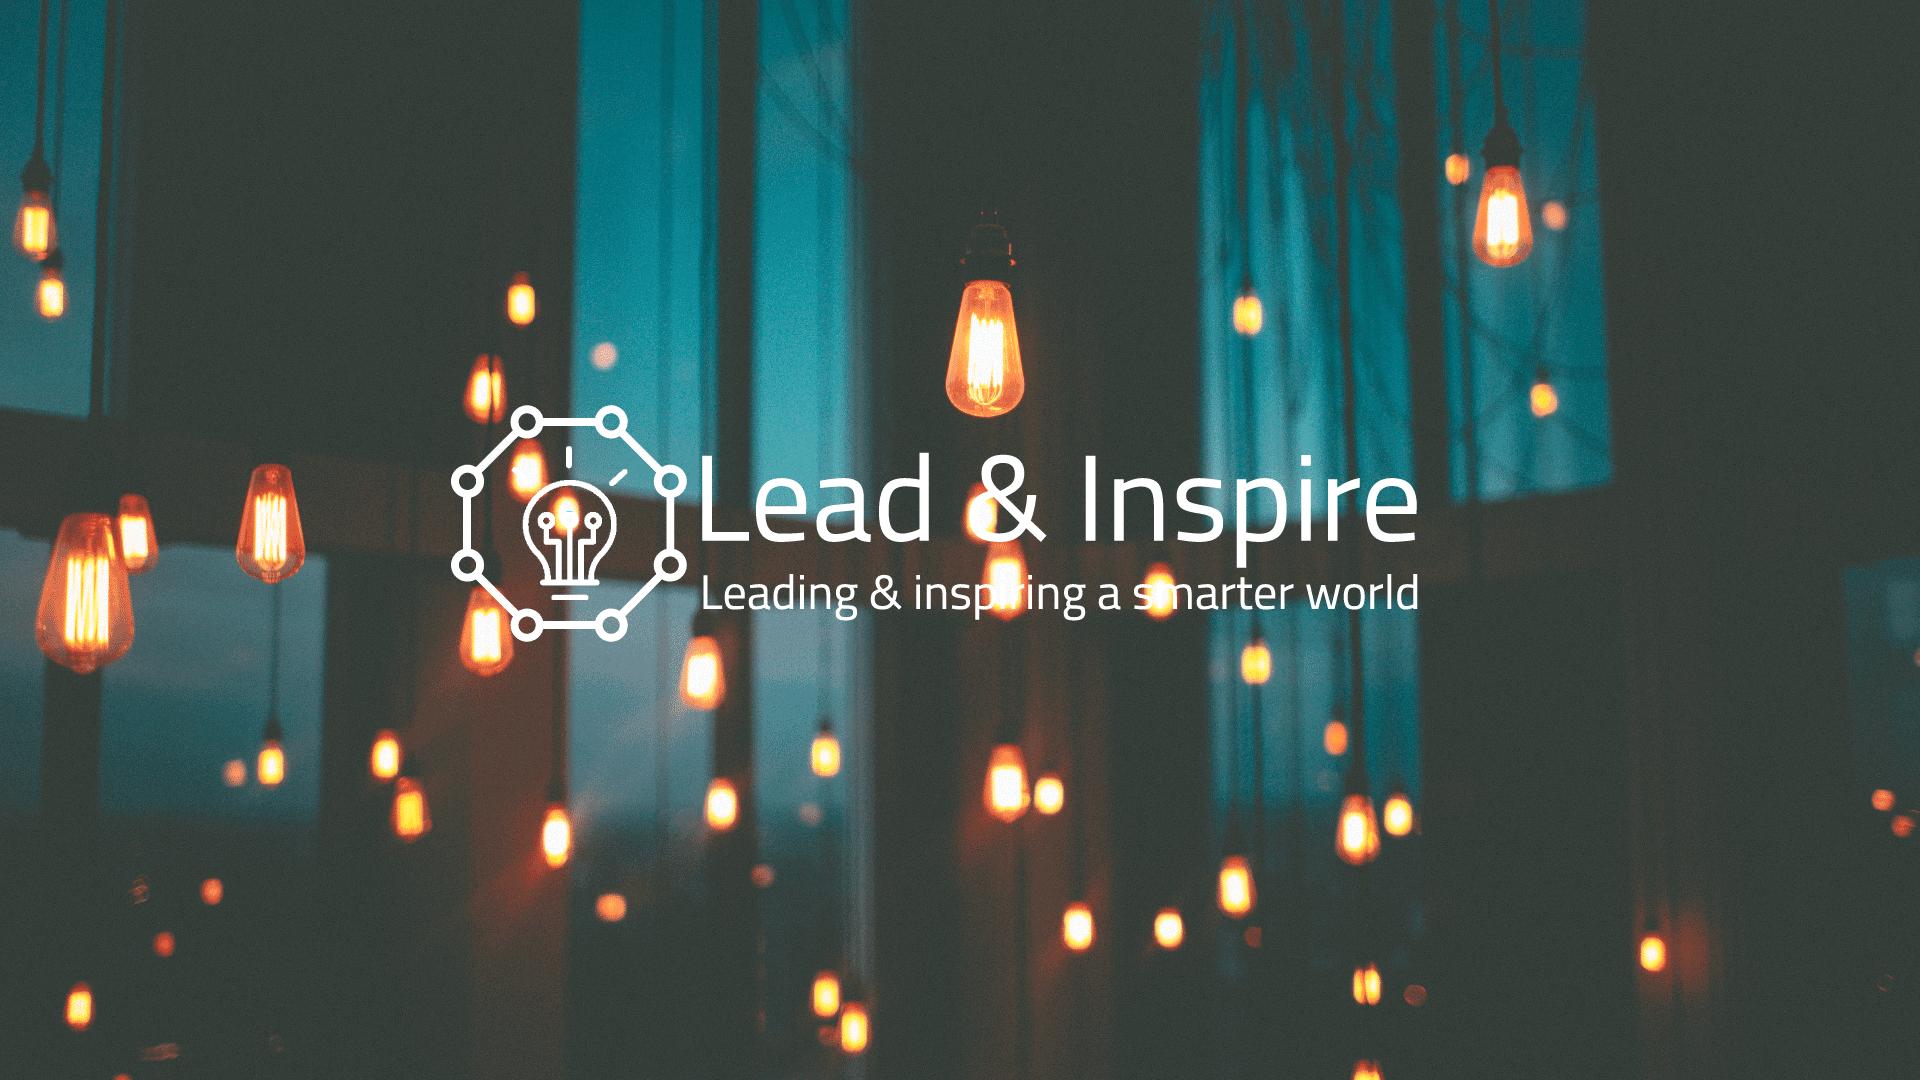 LeadandInspire_2